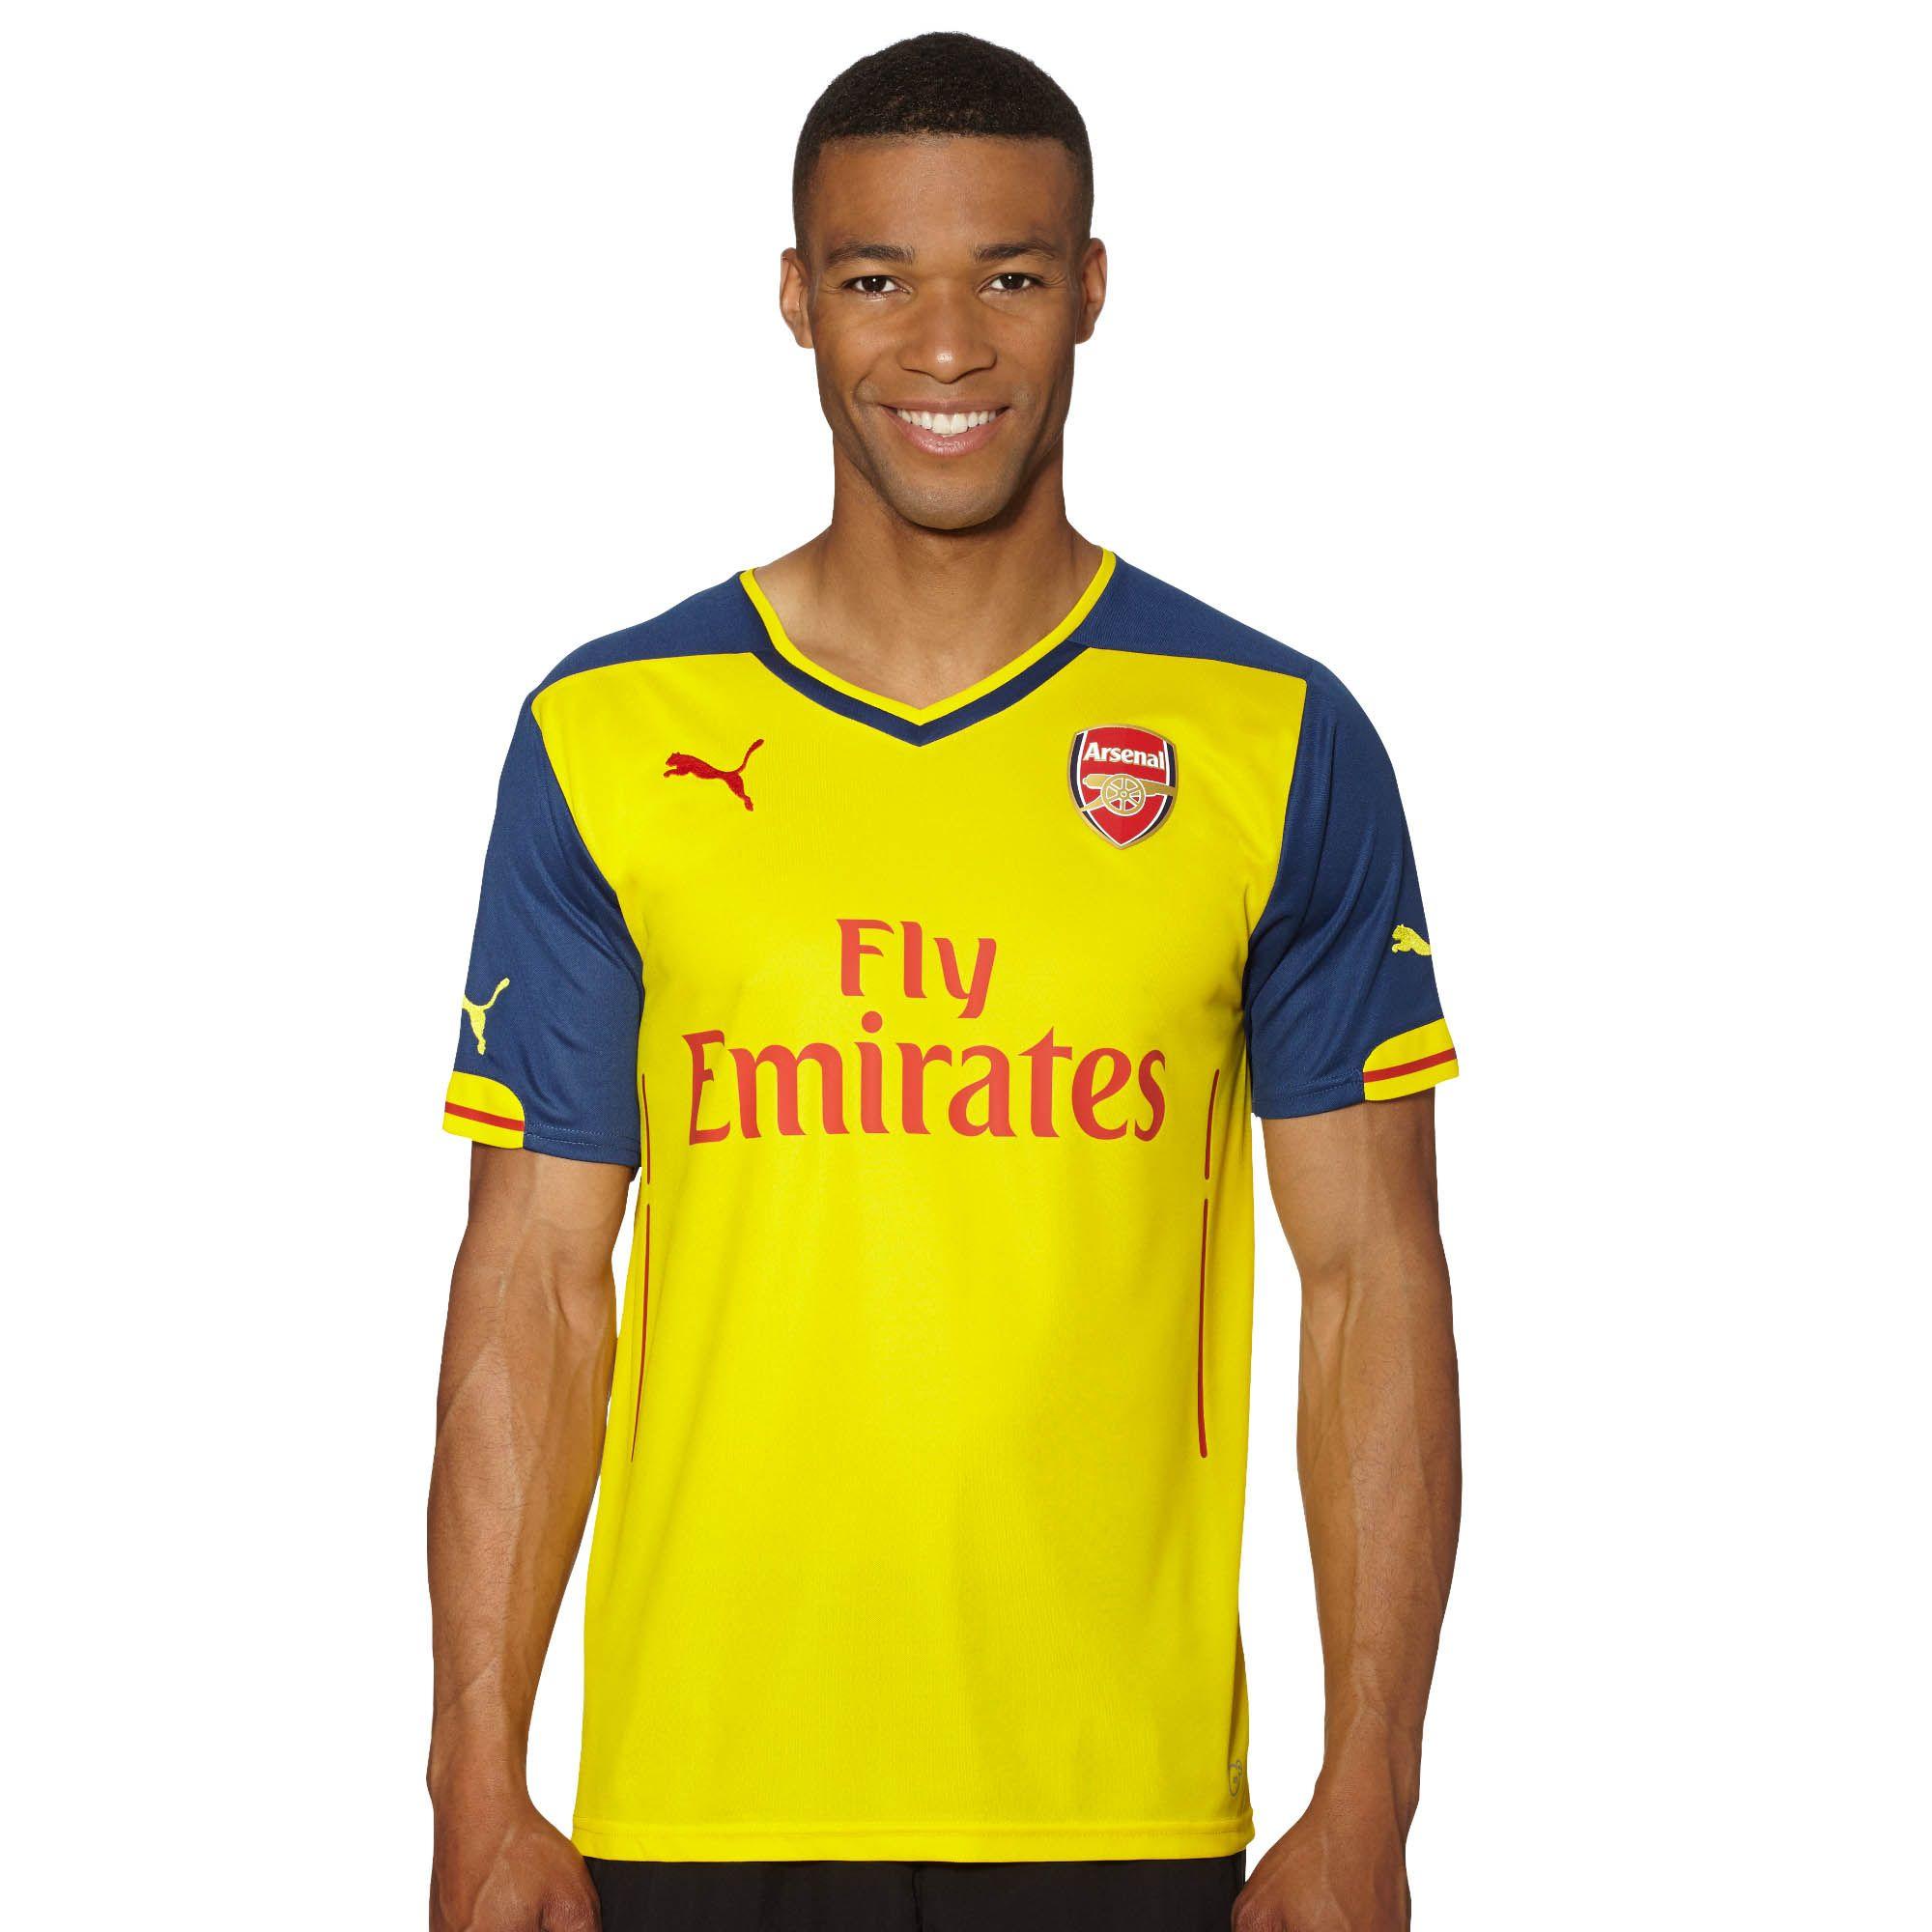 Image of 2014/15 Arsenal Away Replica Jersey